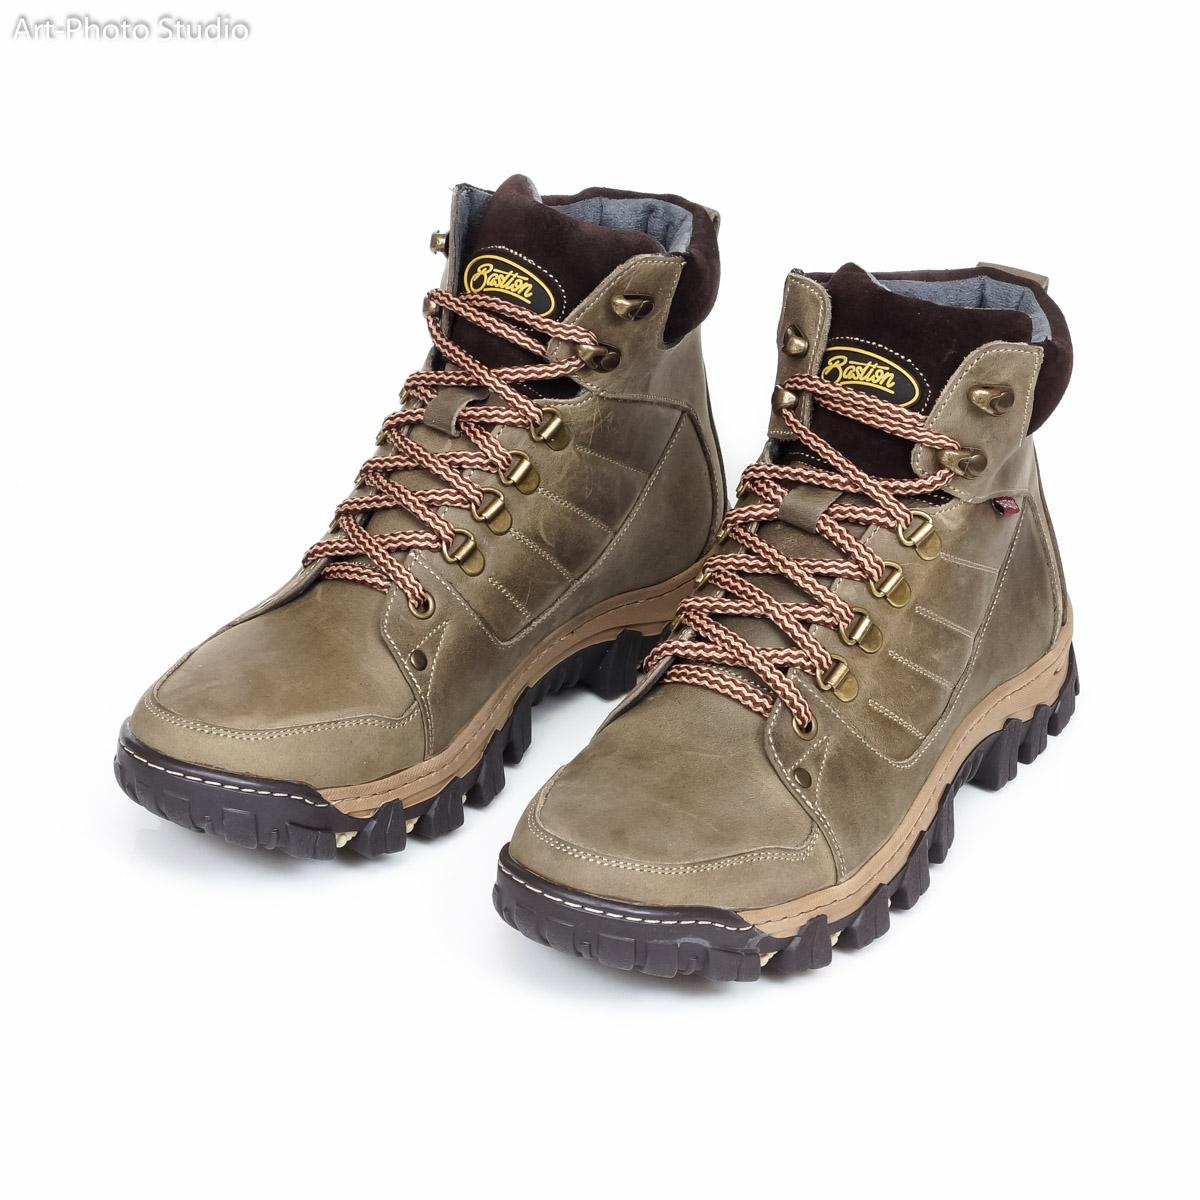 фотографии обуви для интернет-магазина LaModa